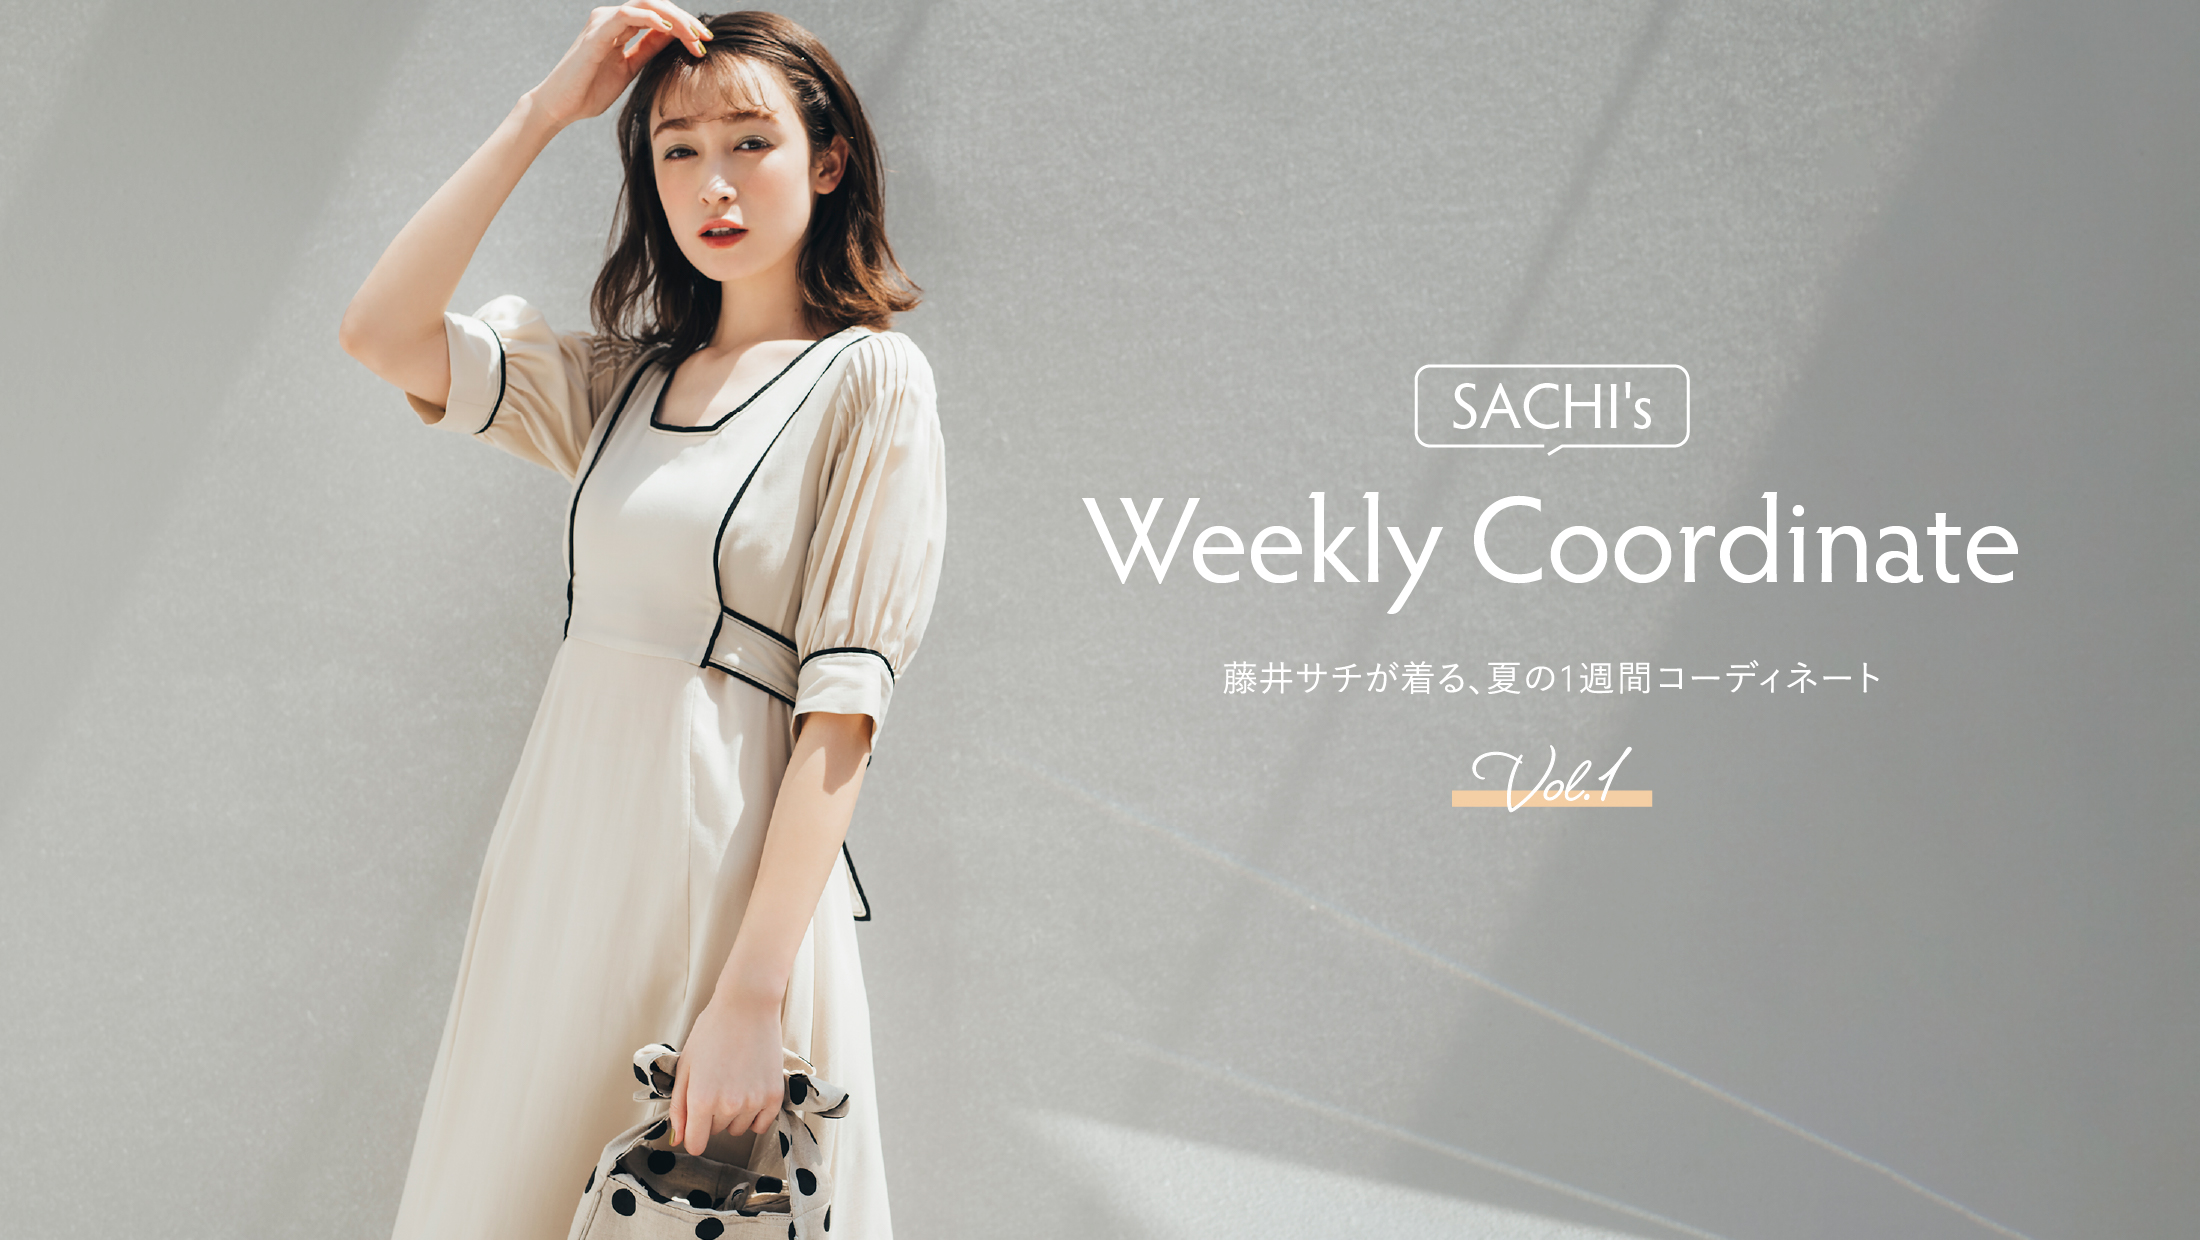 SACHI's Weekly Coordinate